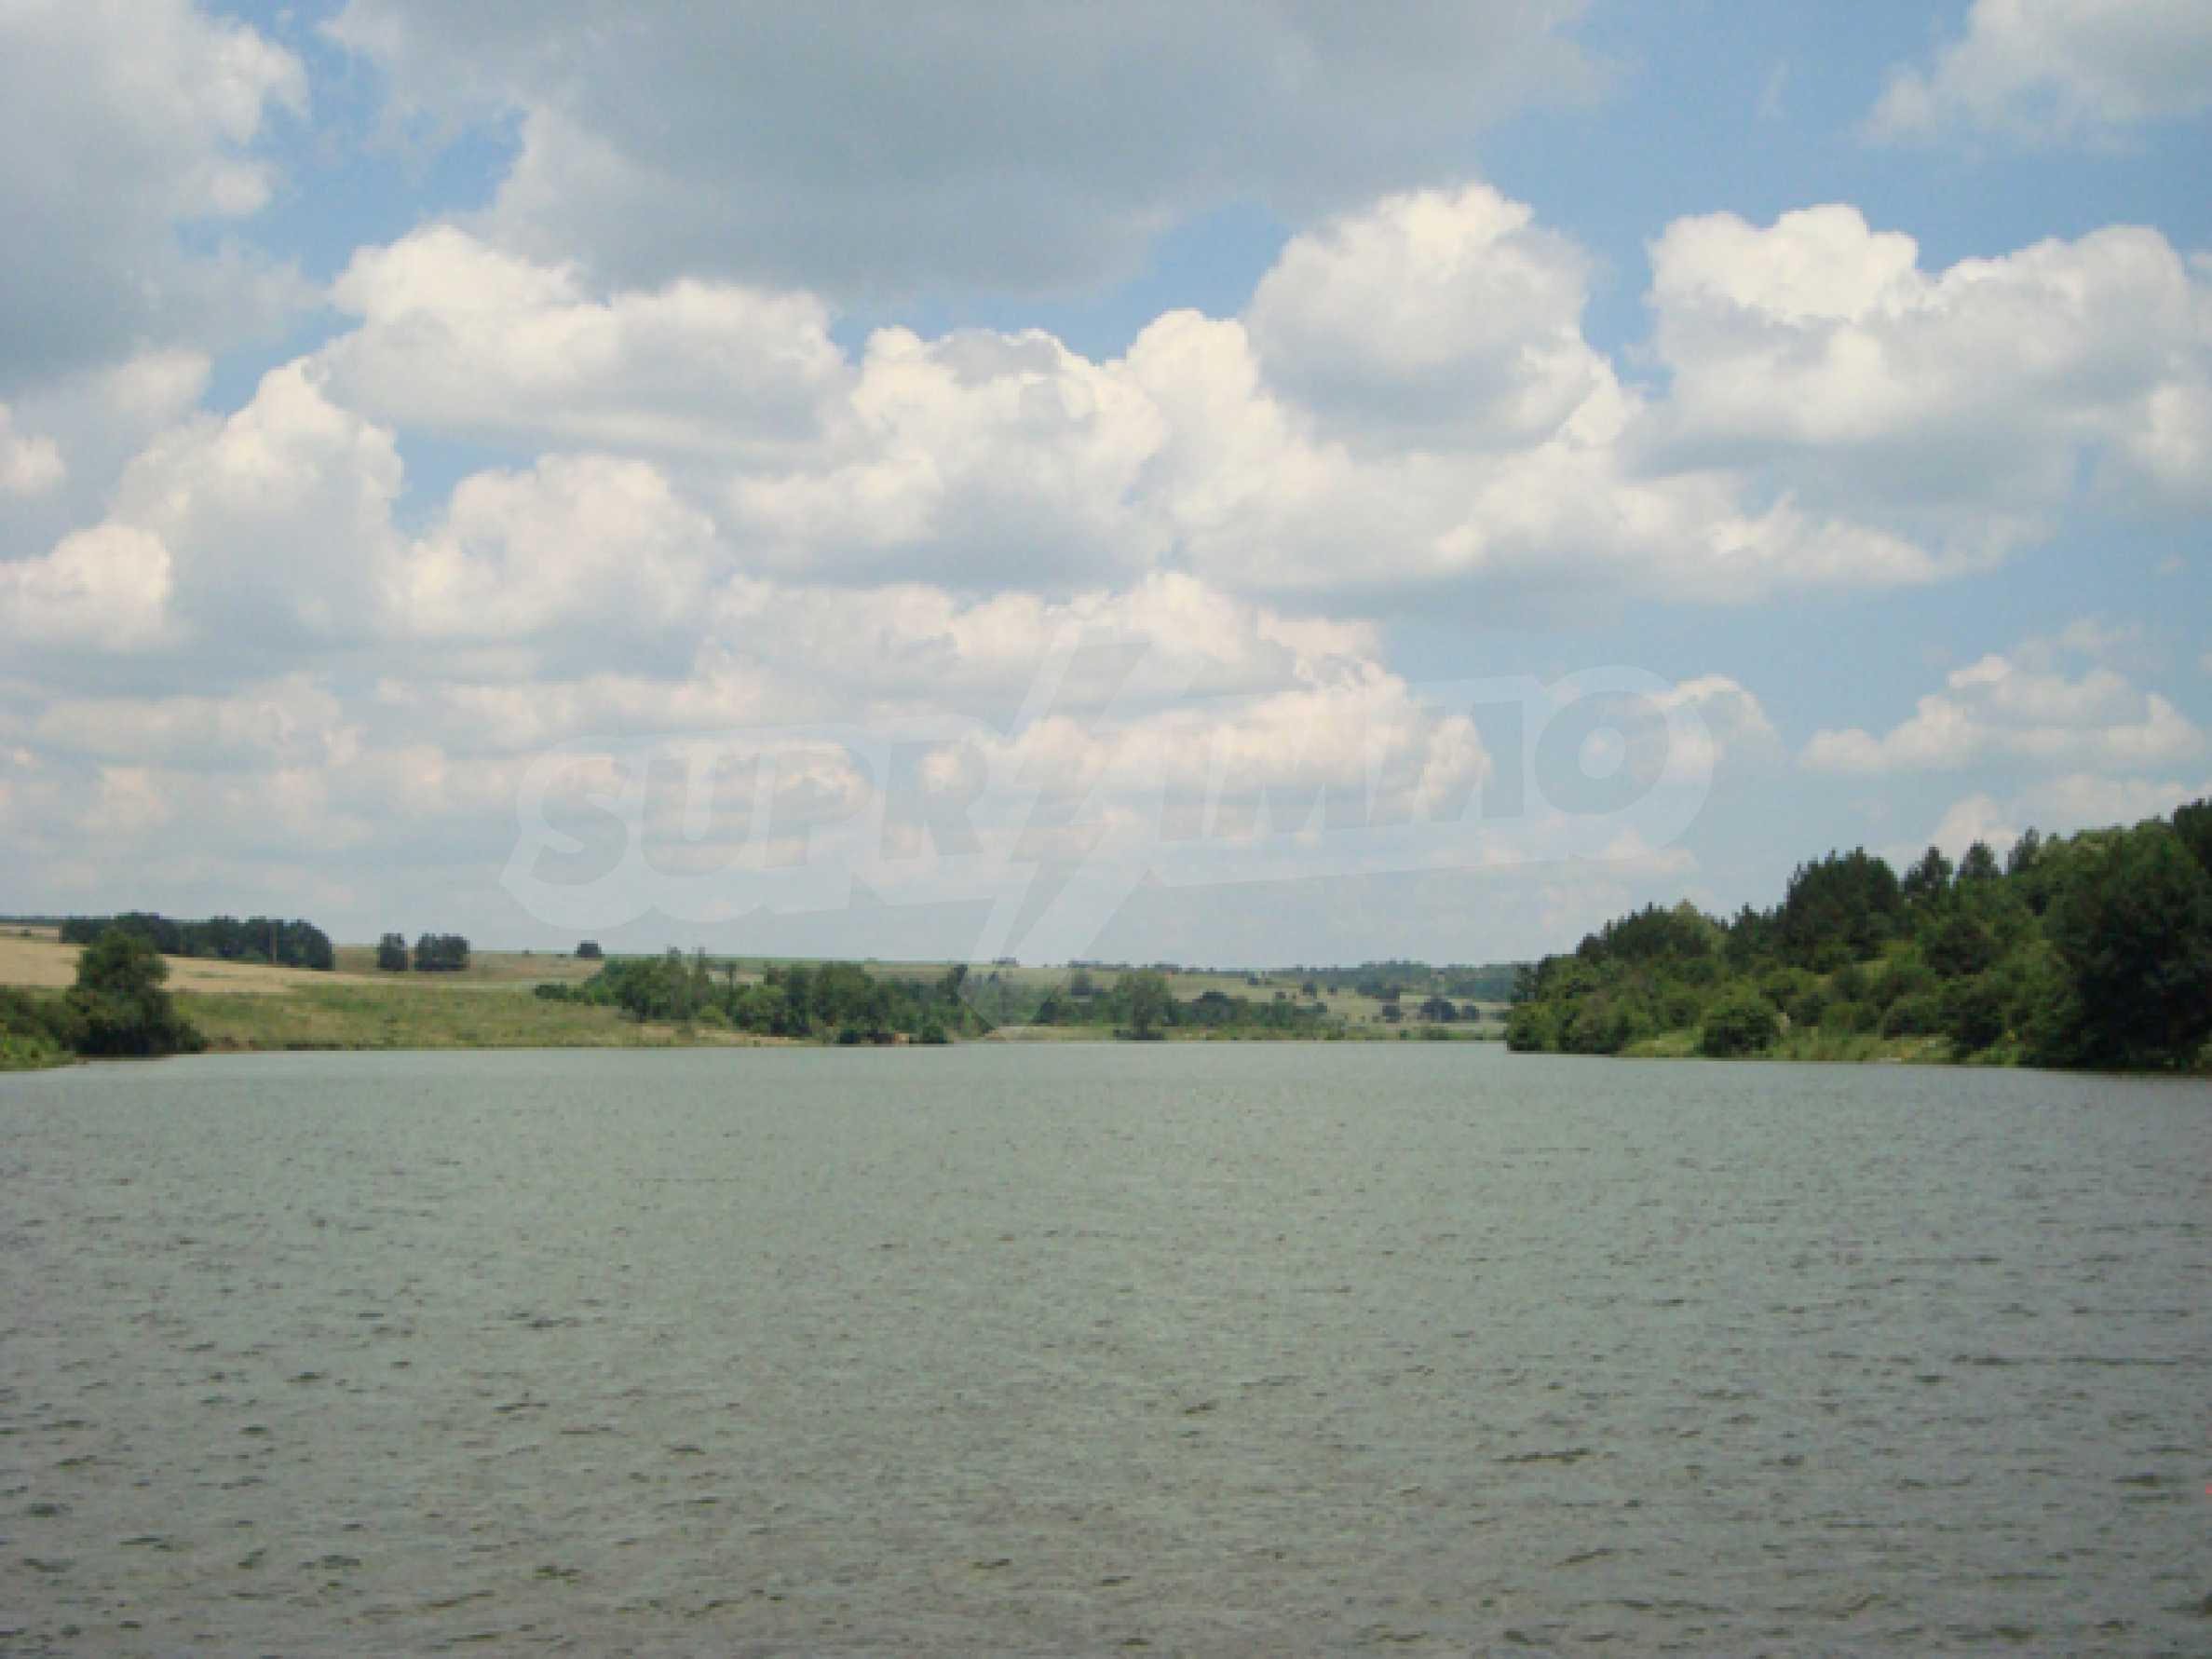 Chalet am Ufer des Nikolaevka-Damms 28